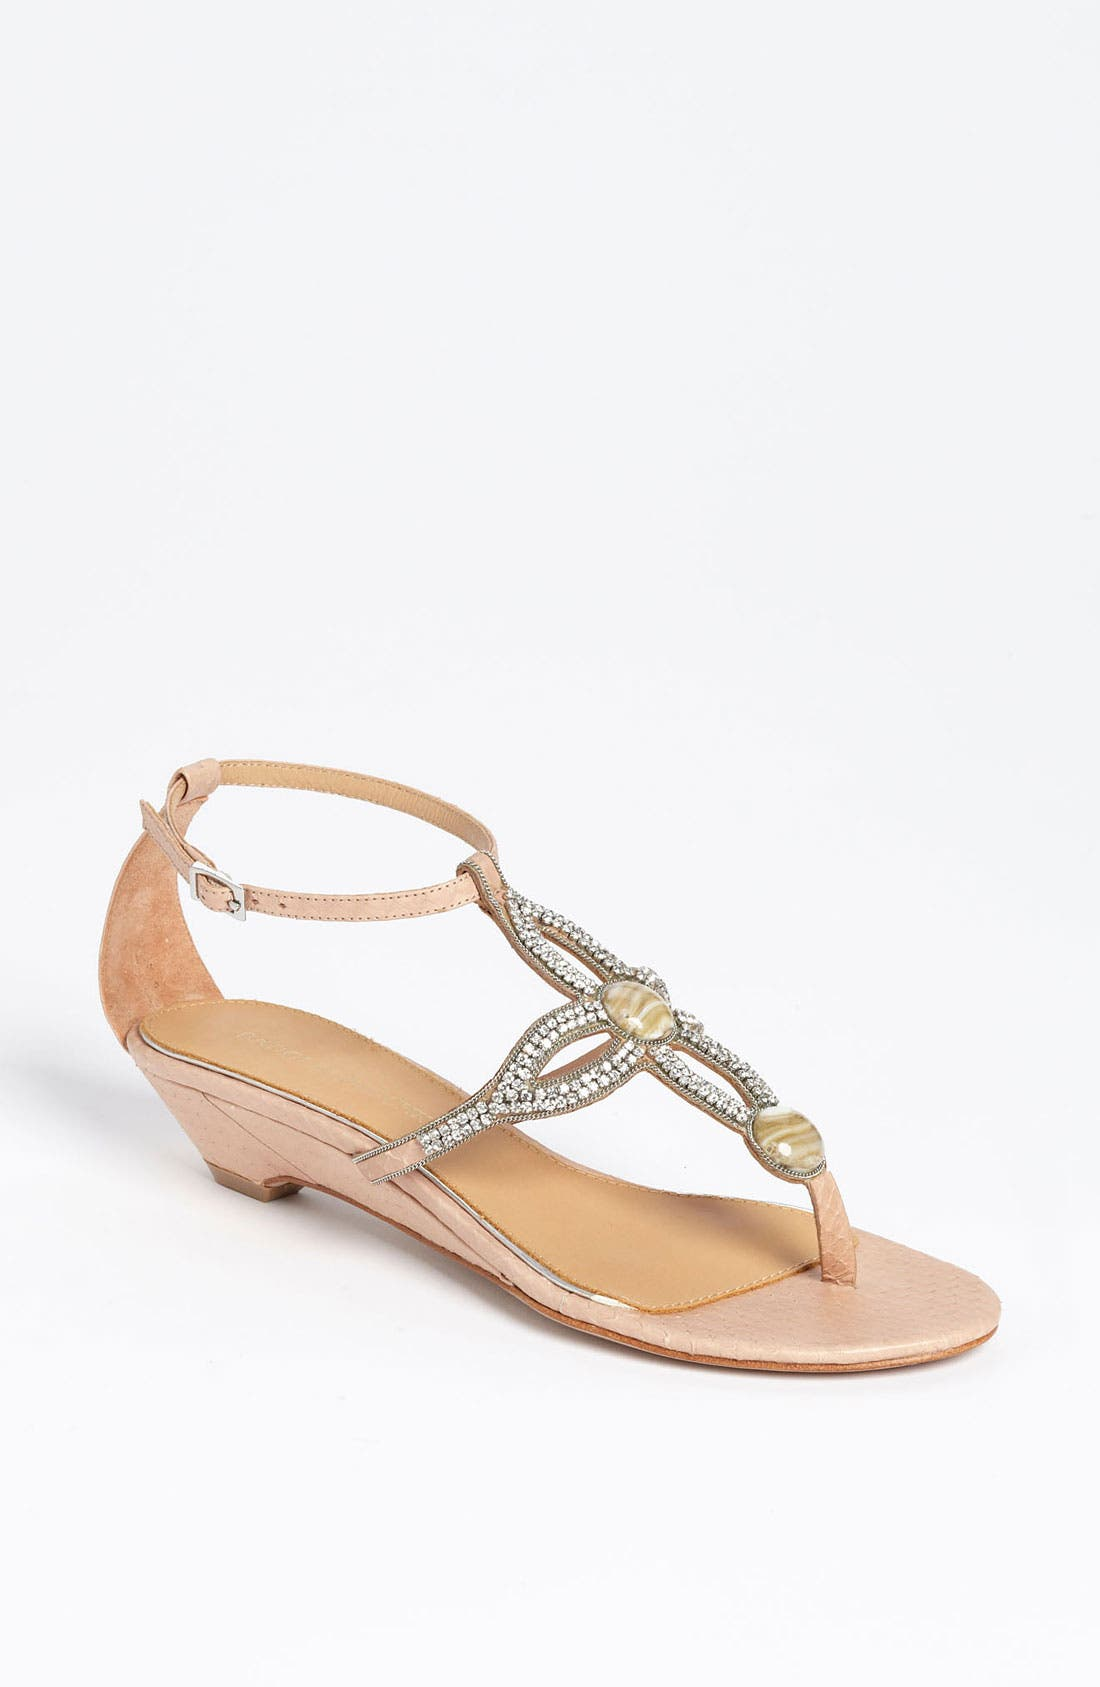 Alternate Image 1 Selected - Badgley Mischka 'Coye' Sandal